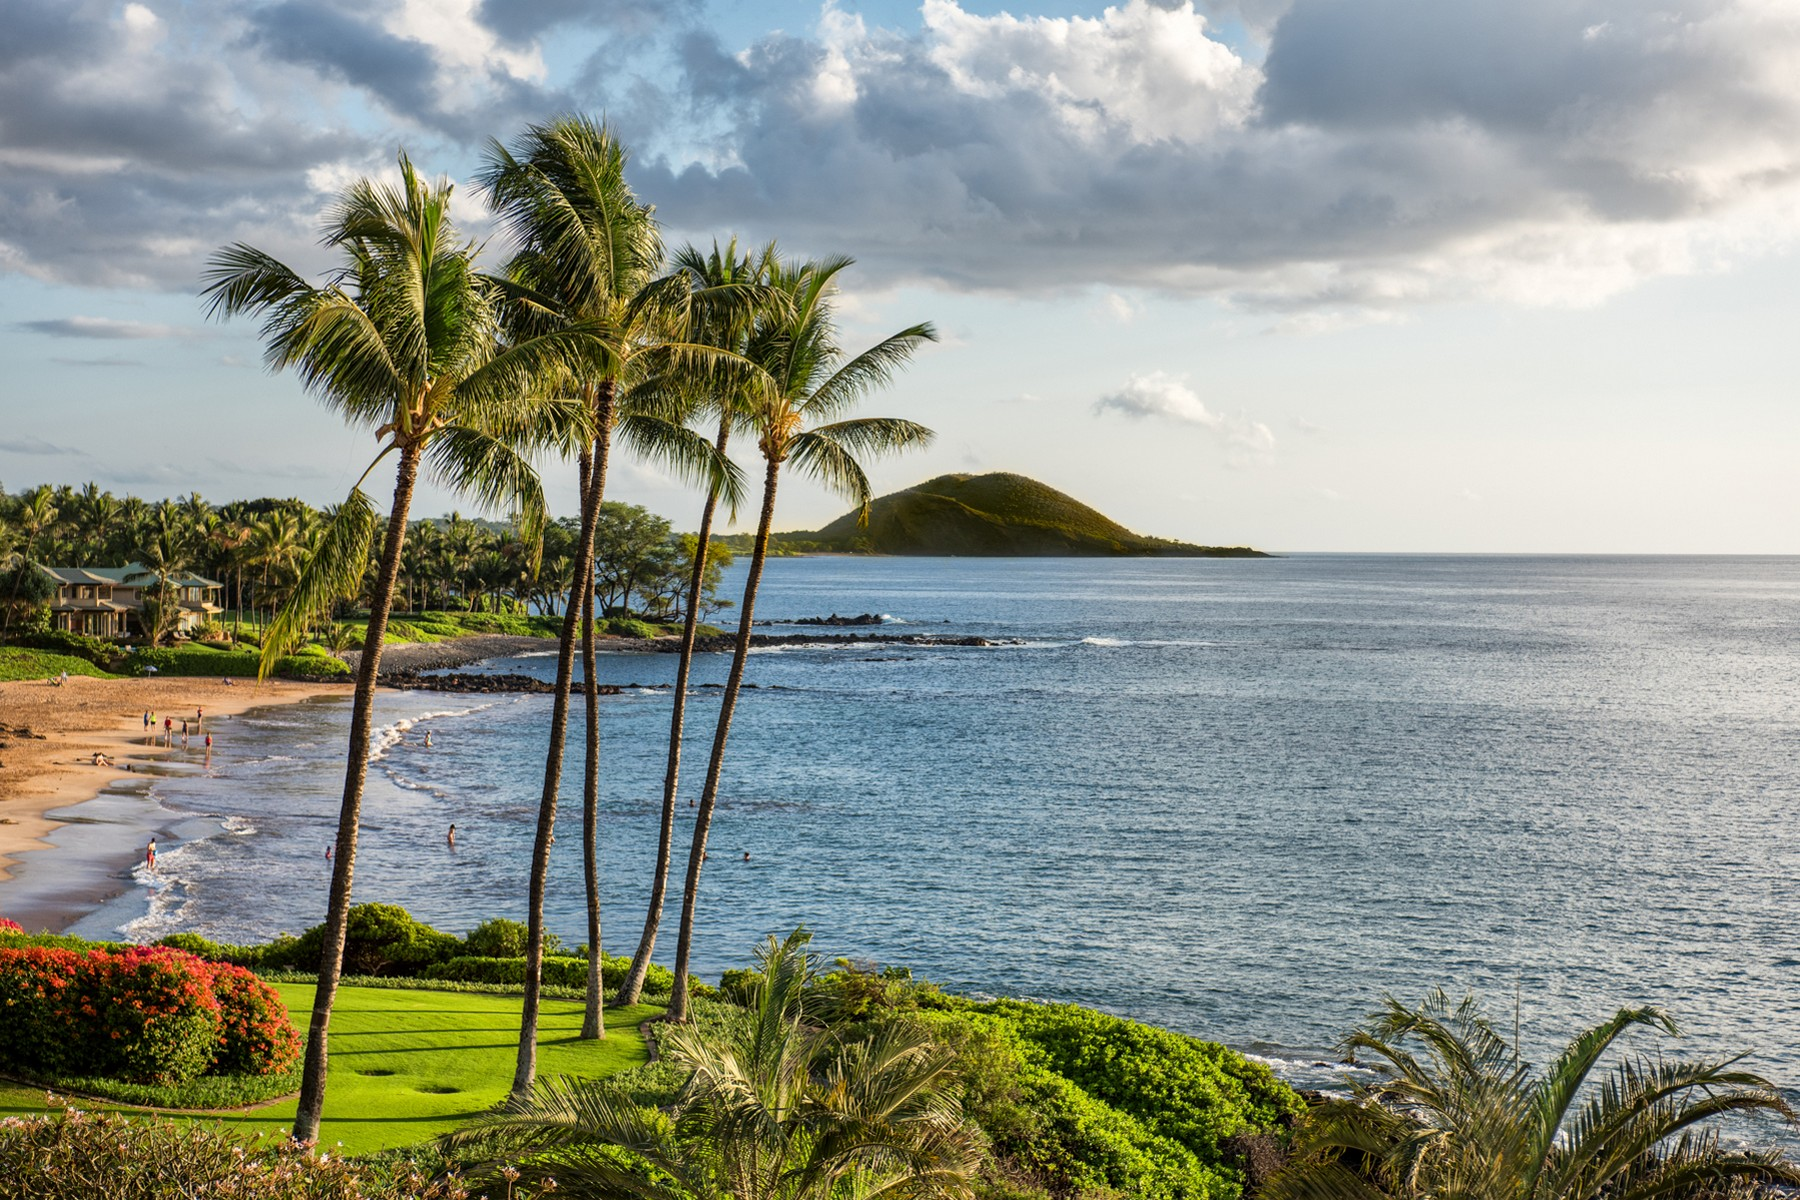 Condomínio para Venda às Wailea's Finest 4000 Wailea Alanui Drive, Wailea Point 1401 Wailea, Havaí, 96753 Estados Unidos